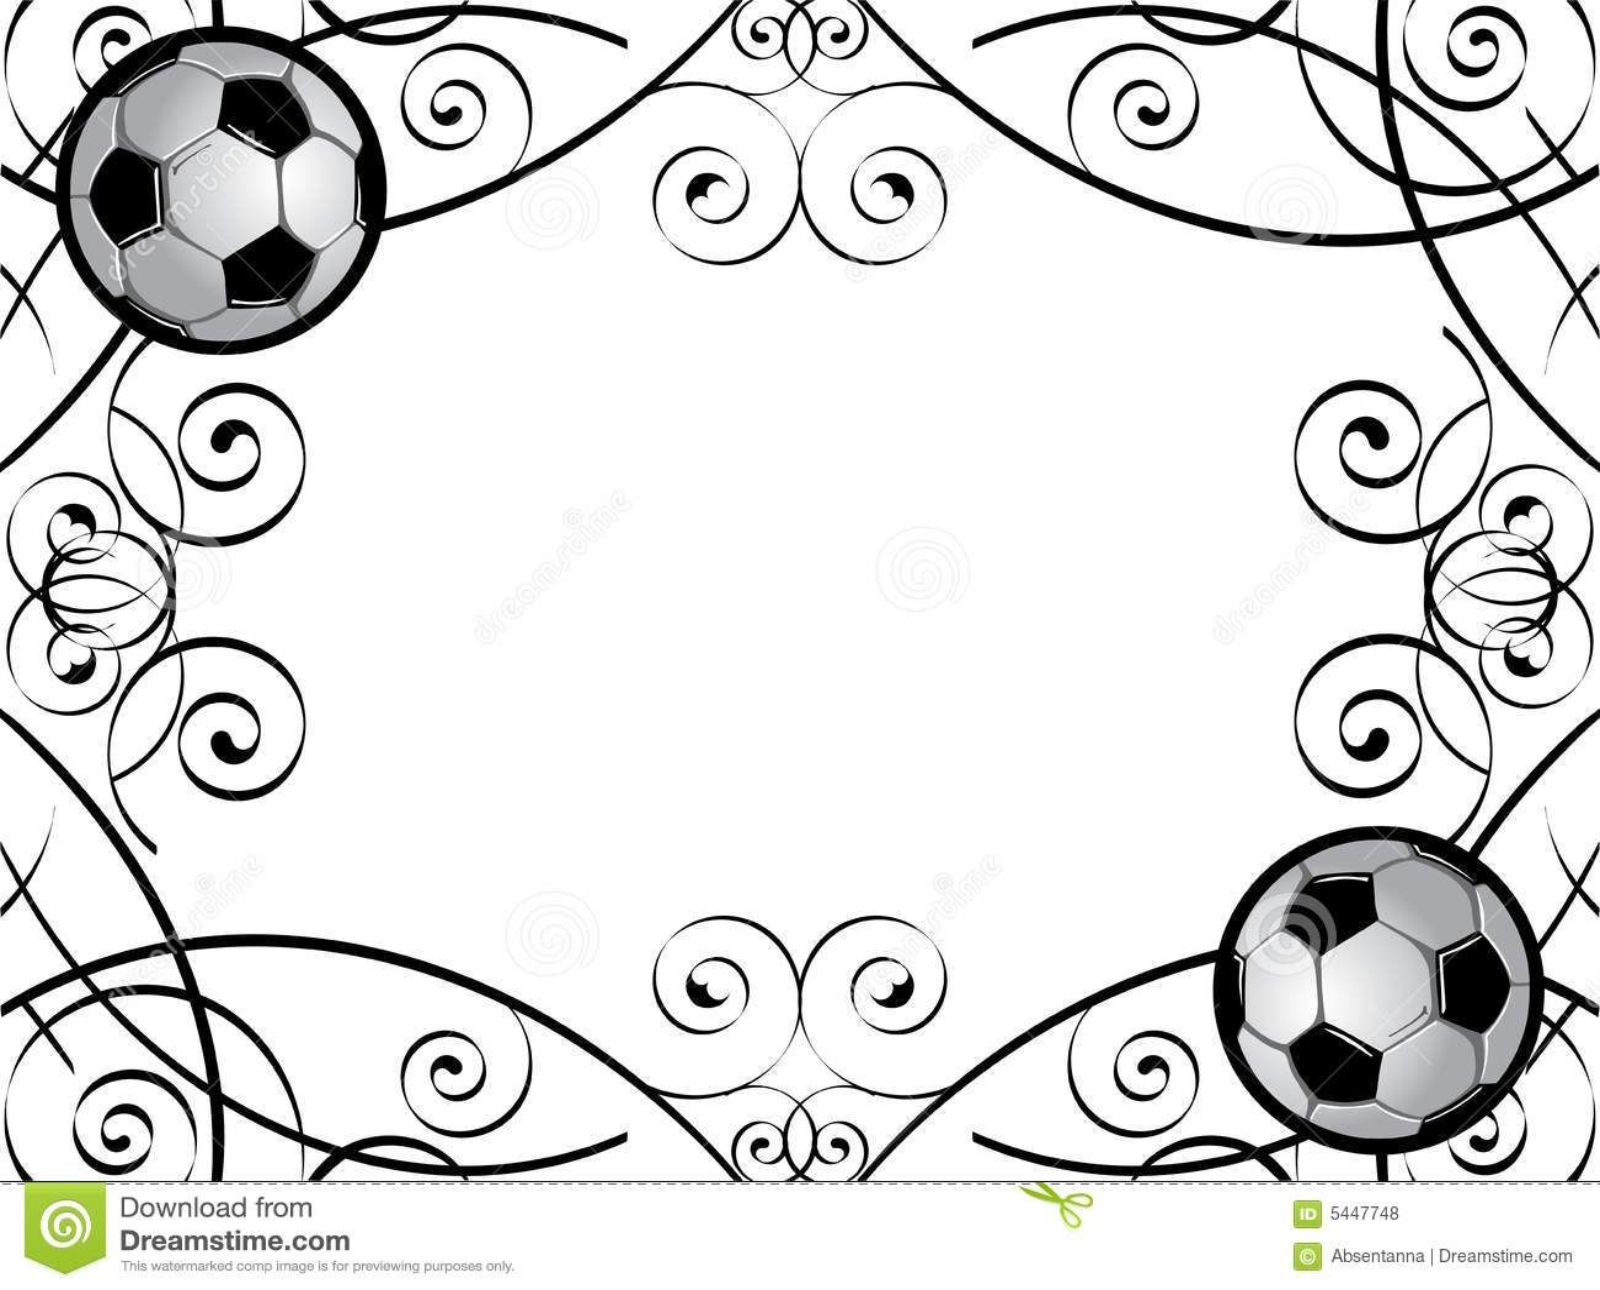 Soccer frame / border stock illustration. Illustration of decoration ...